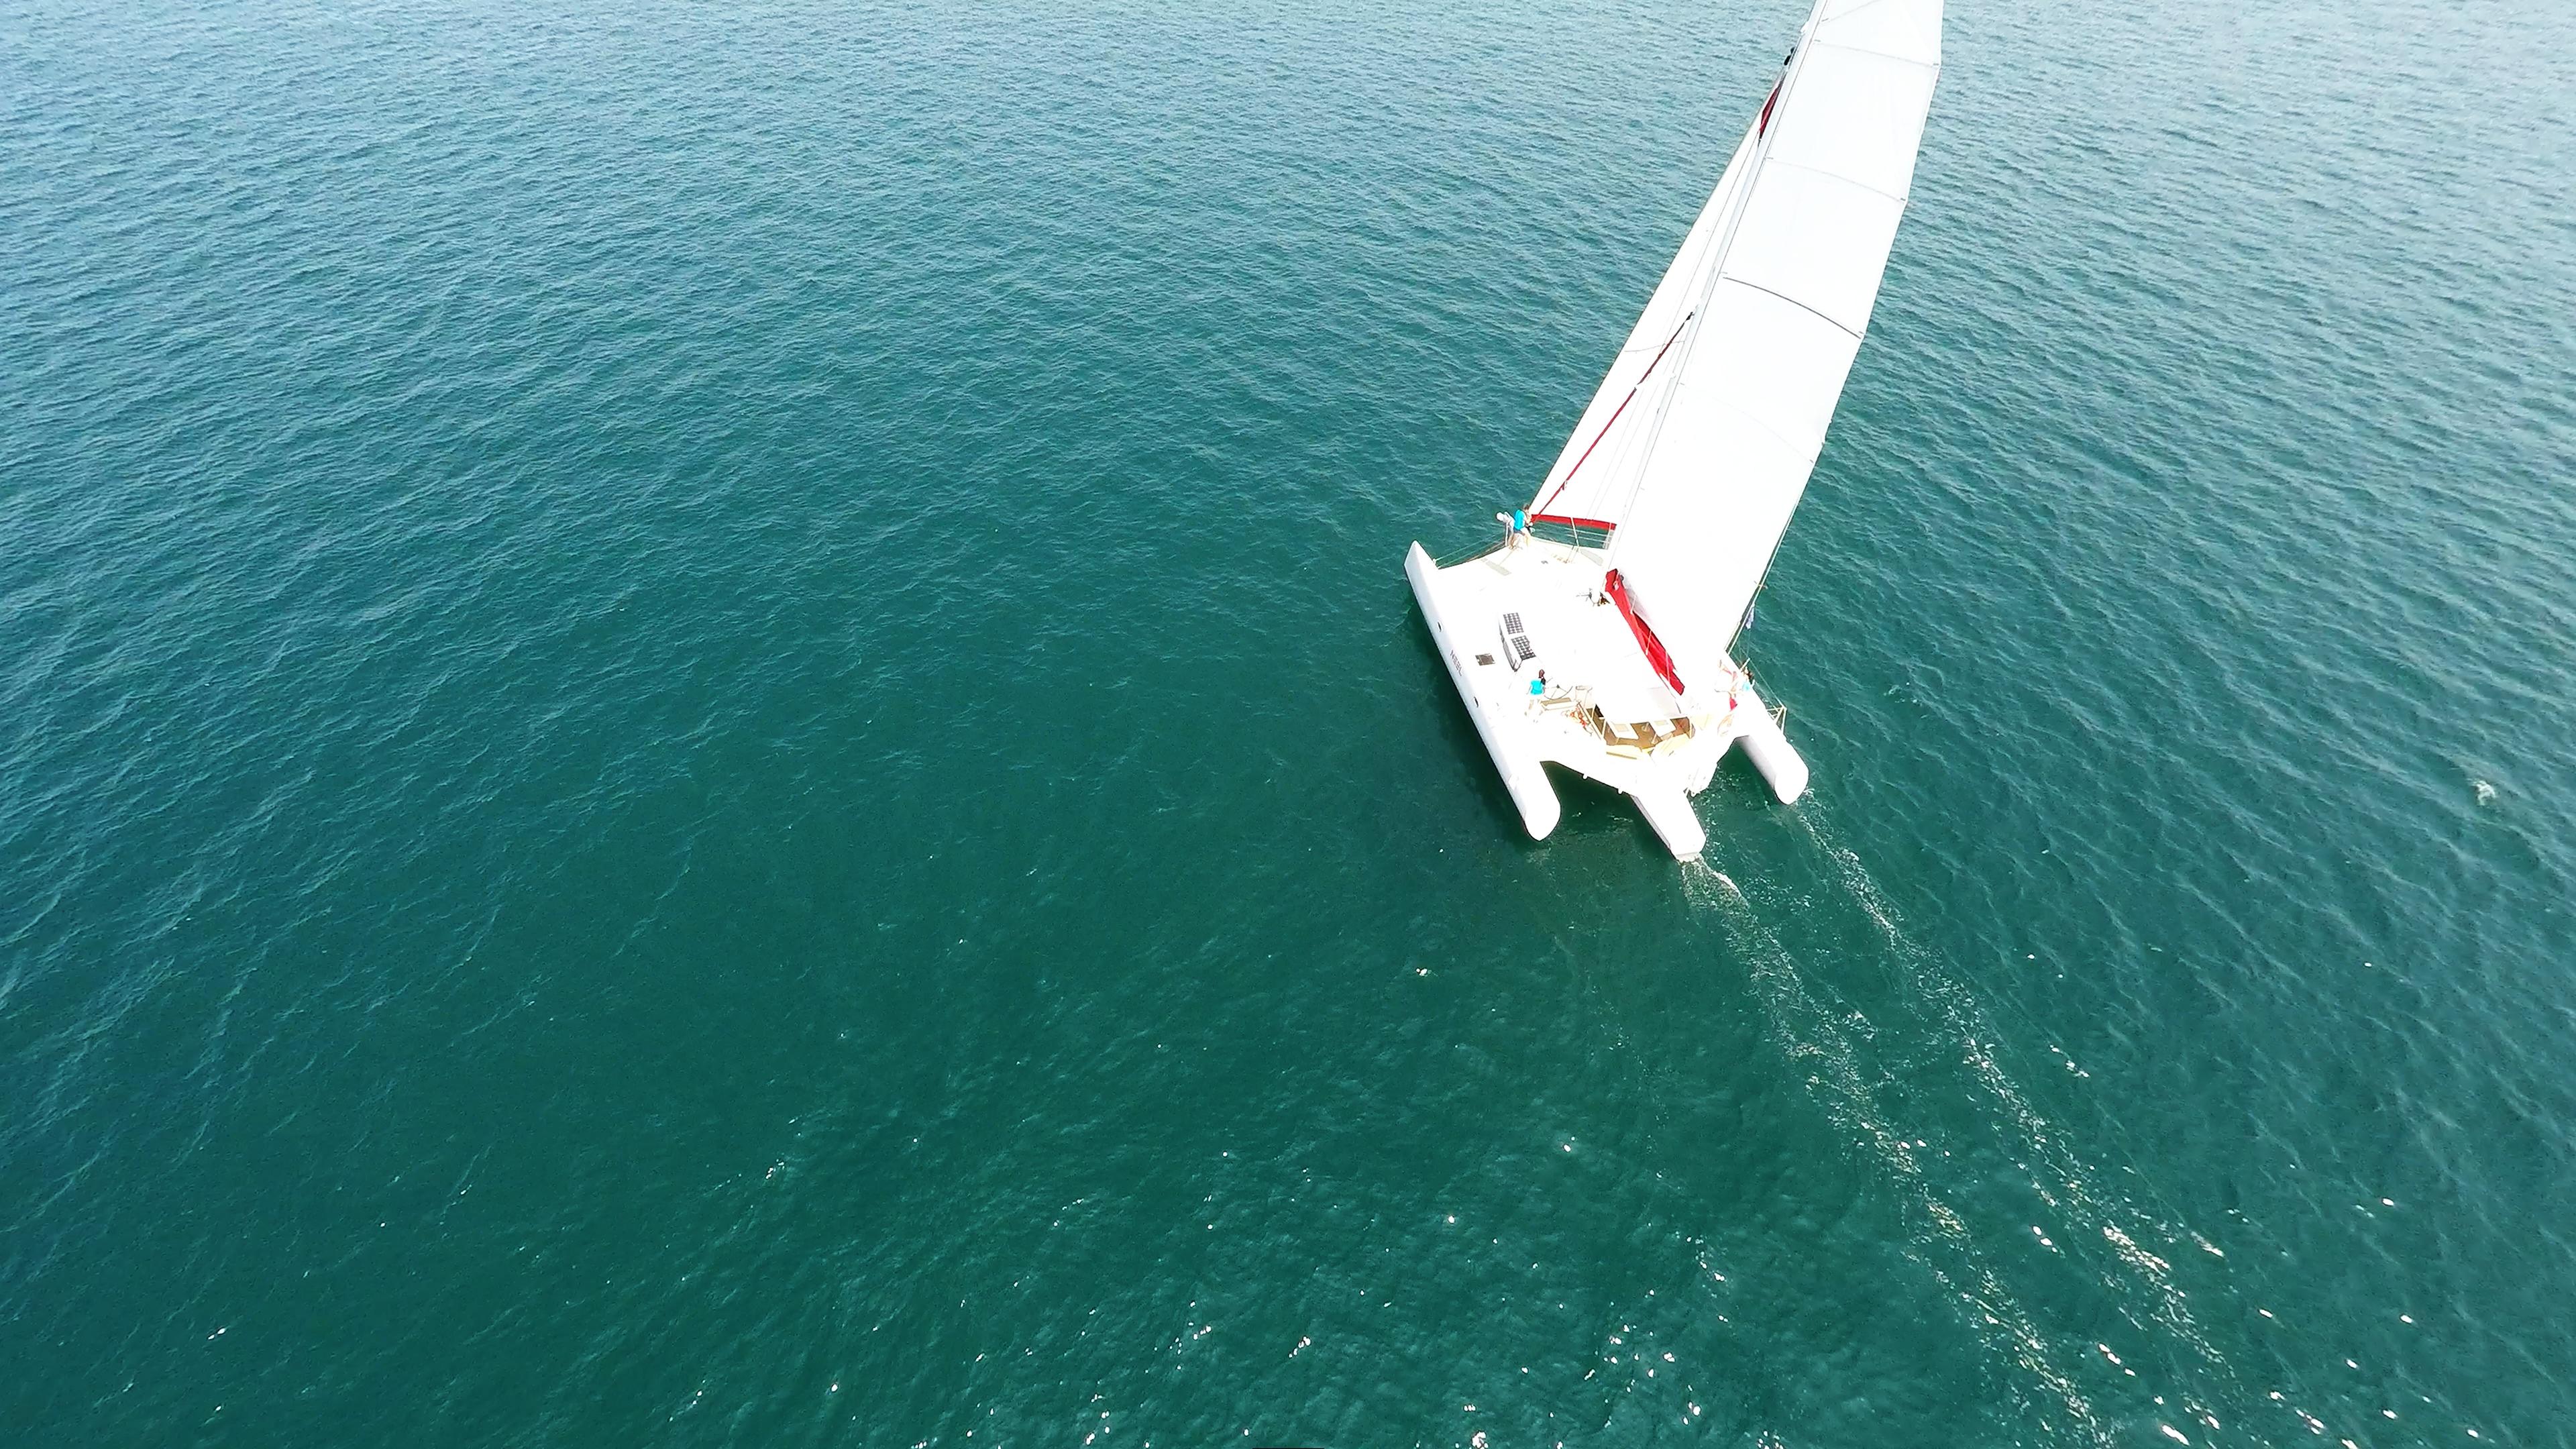 trimaran aerial photo sailing